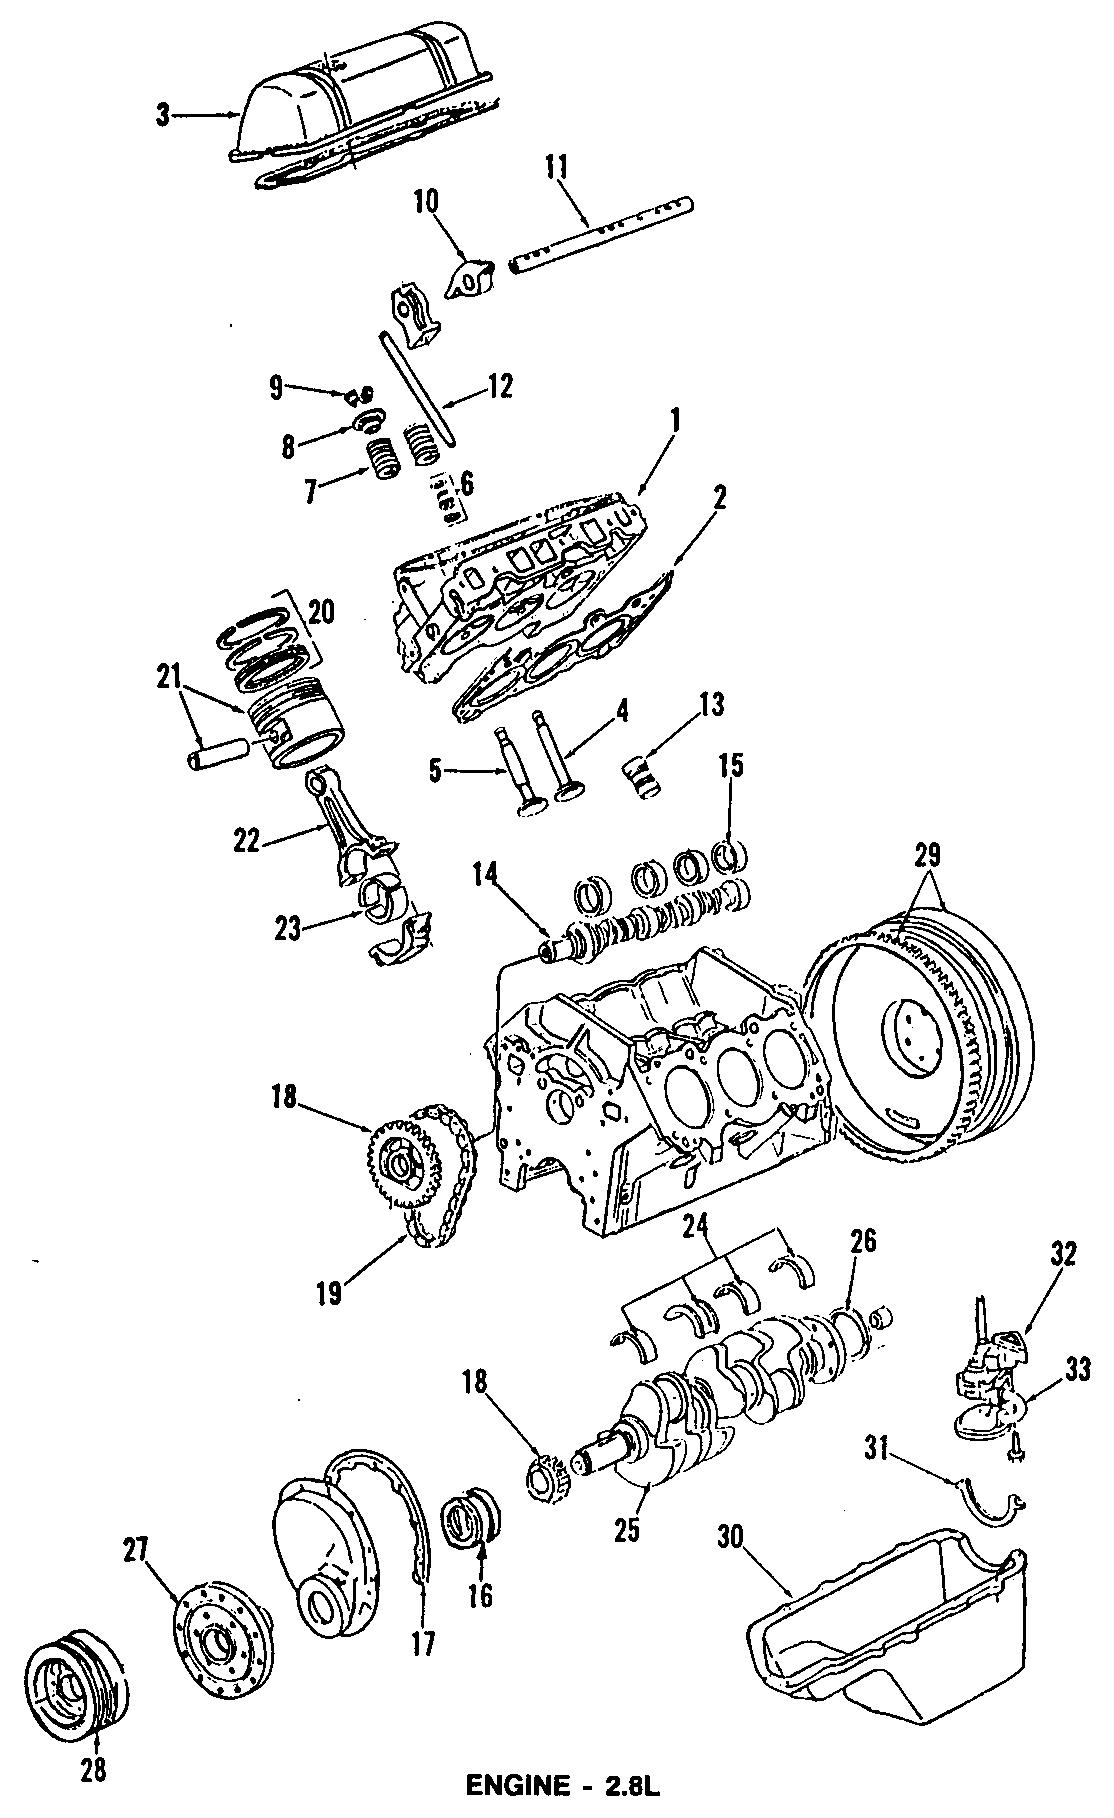 Gmc Sonoma Engine Rocker Arm Engine Rocker Arm Rocker